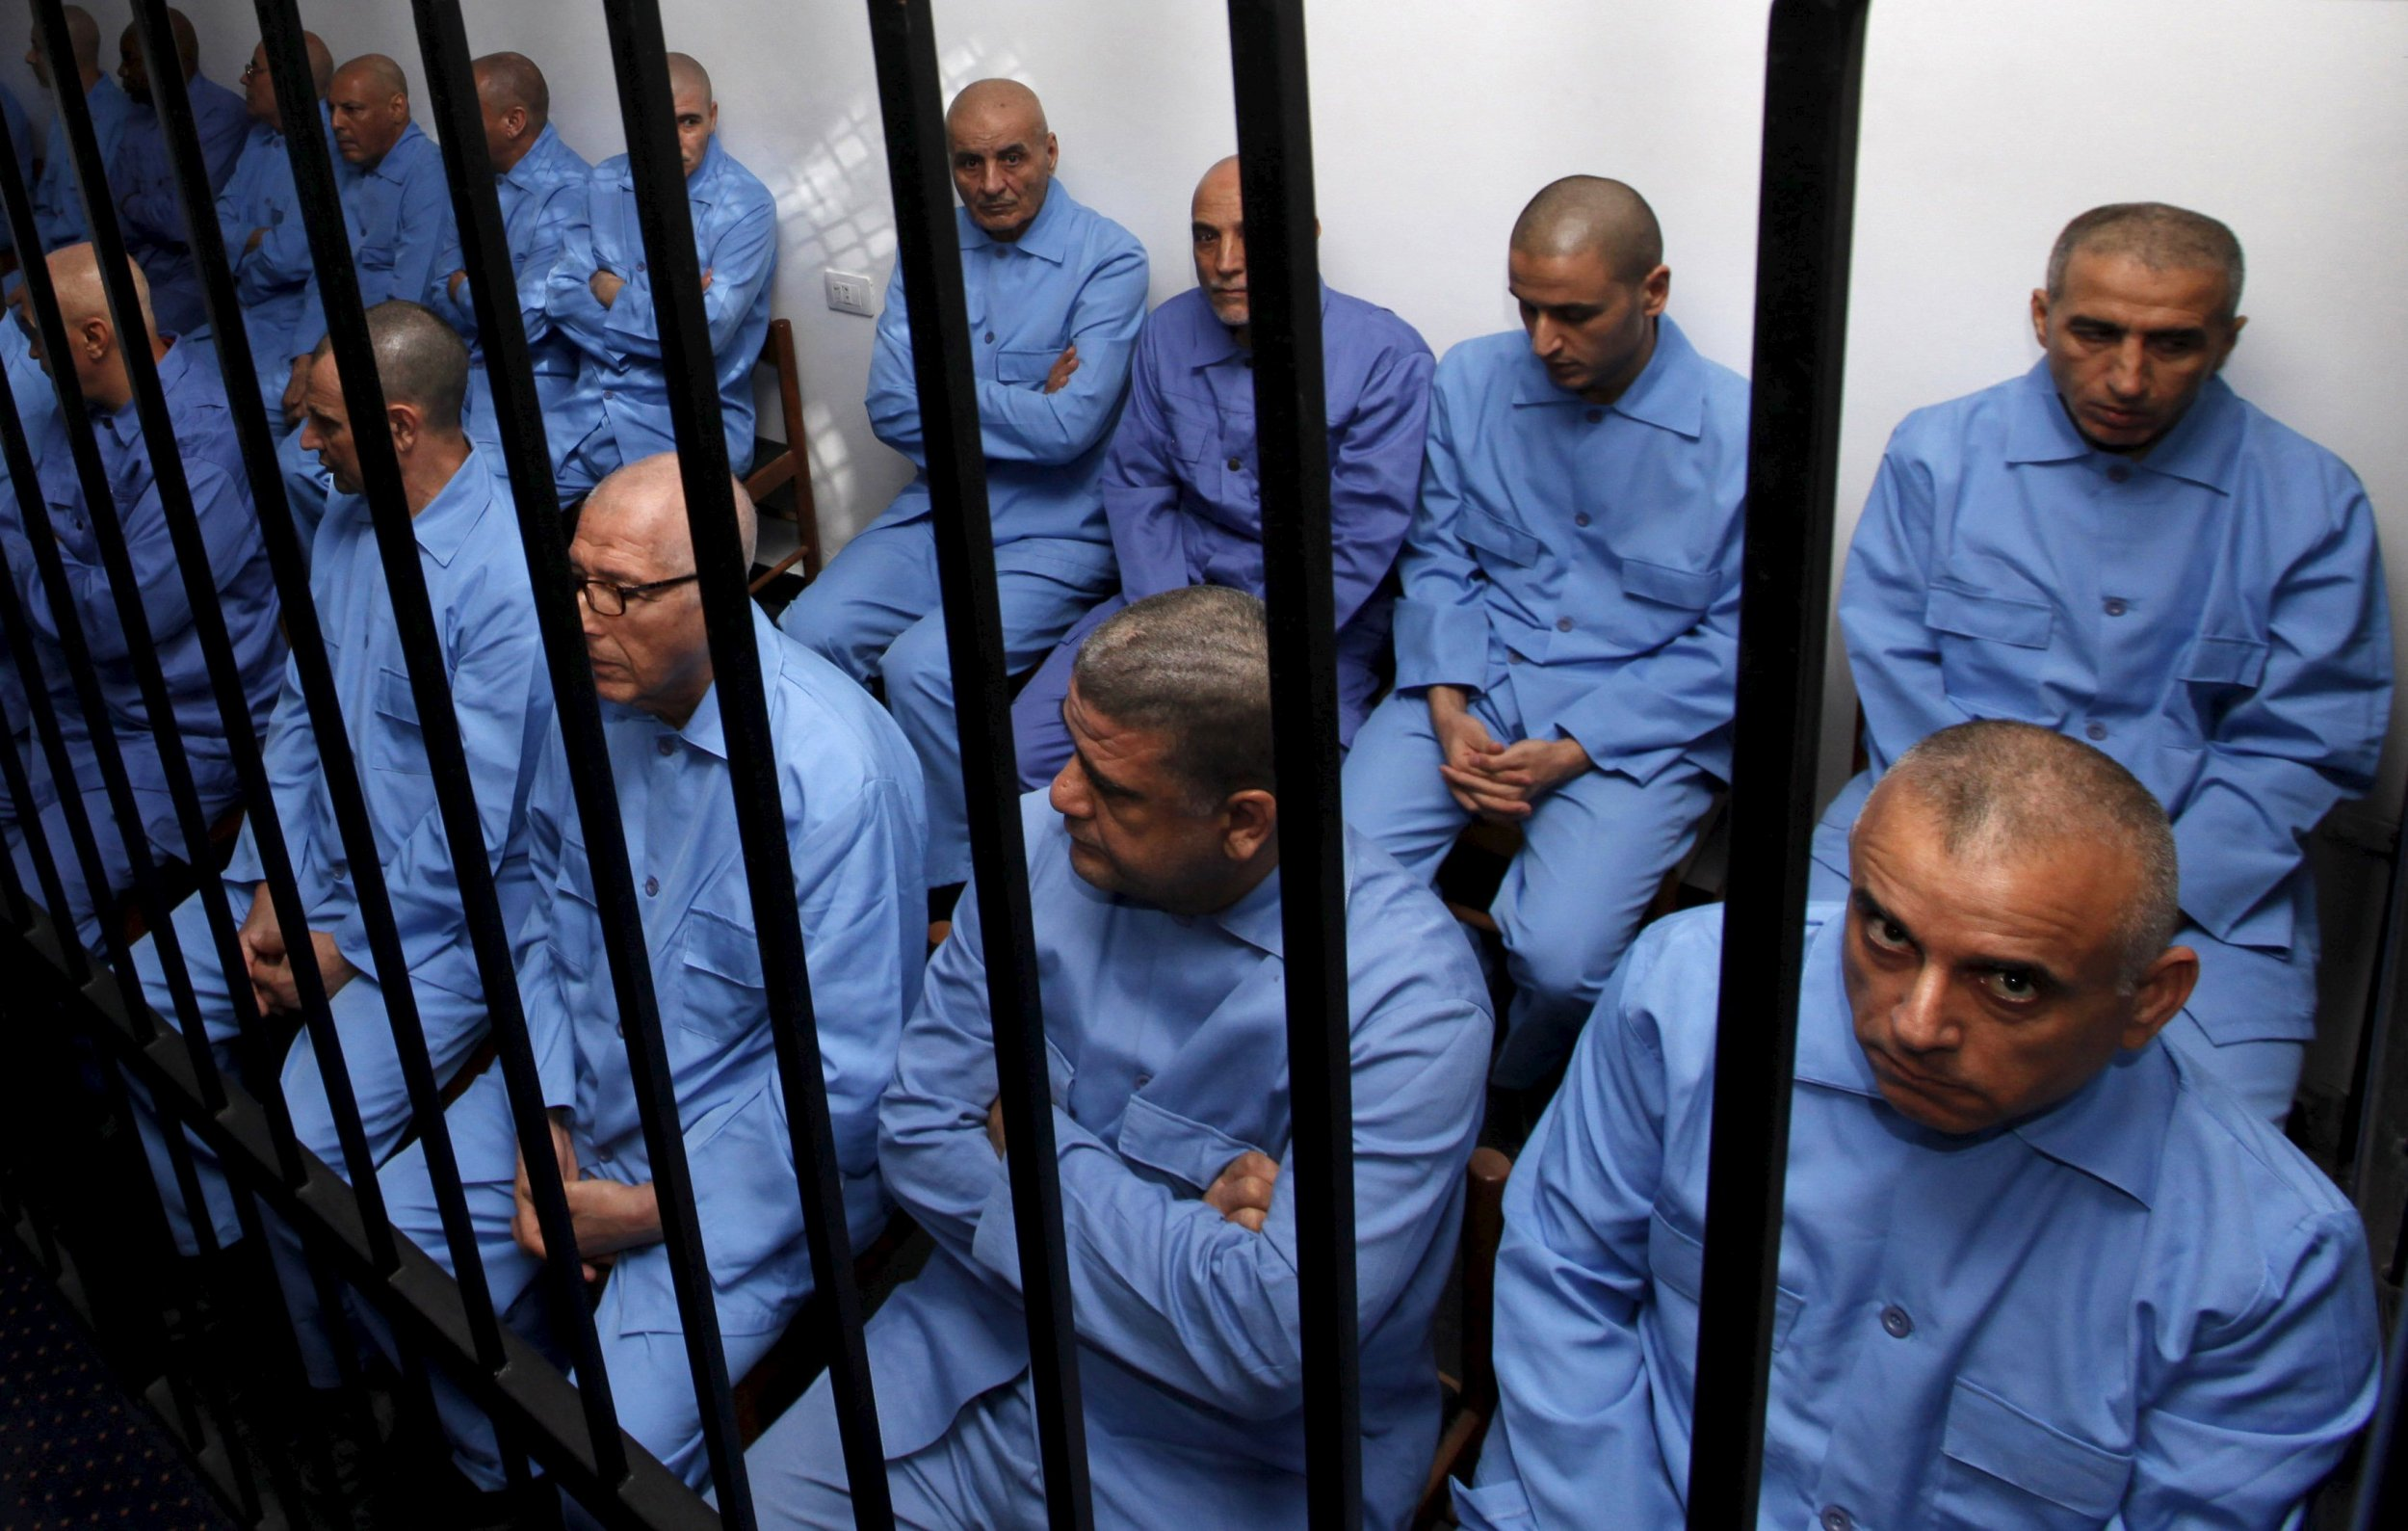 libya statement of gaddafi